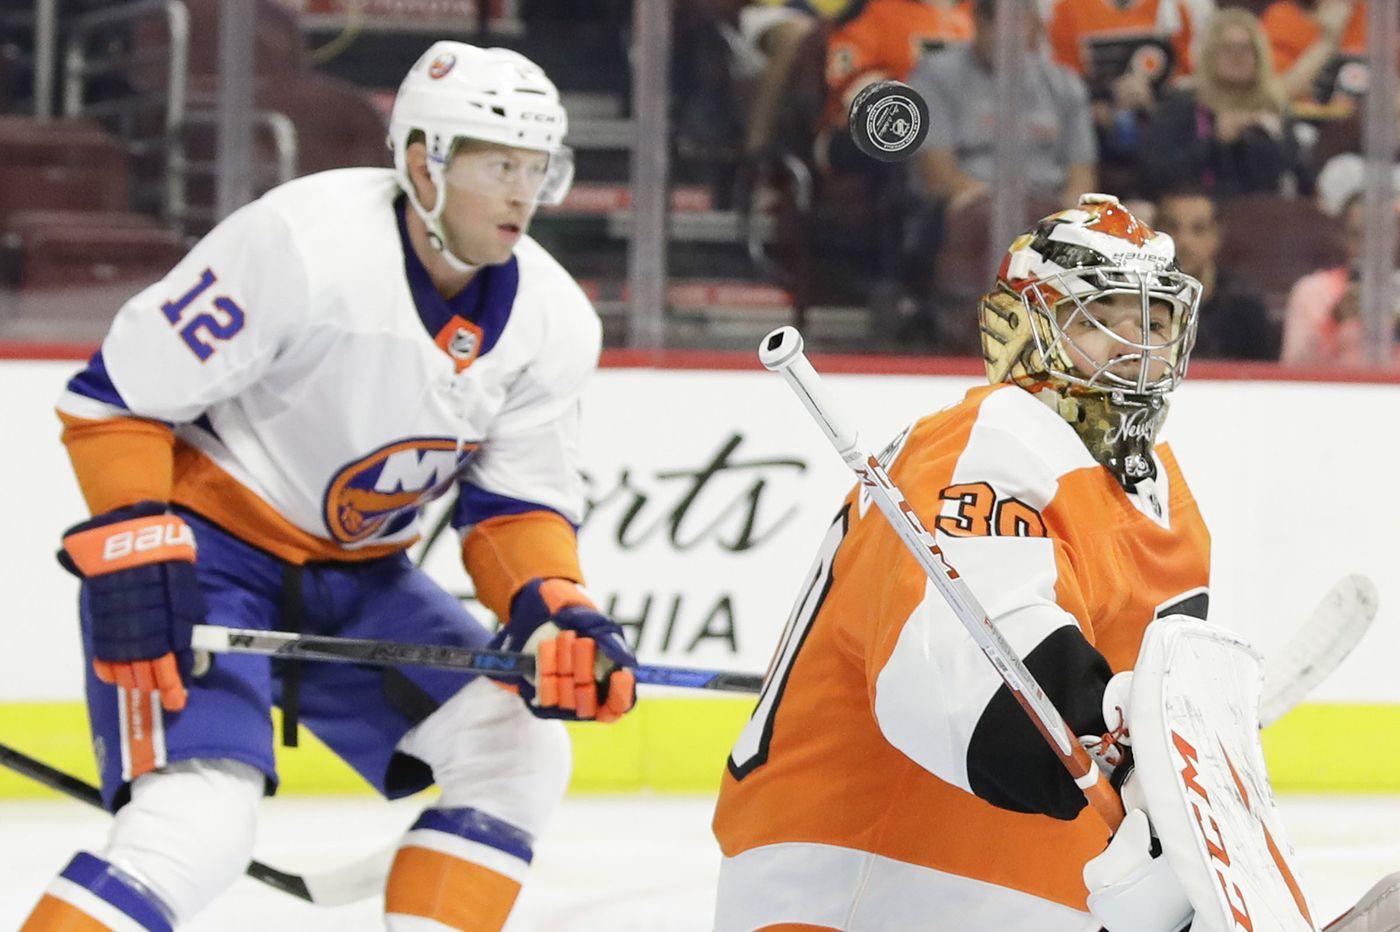 Telltale season for Flyers' goalie Michal Neuvirth